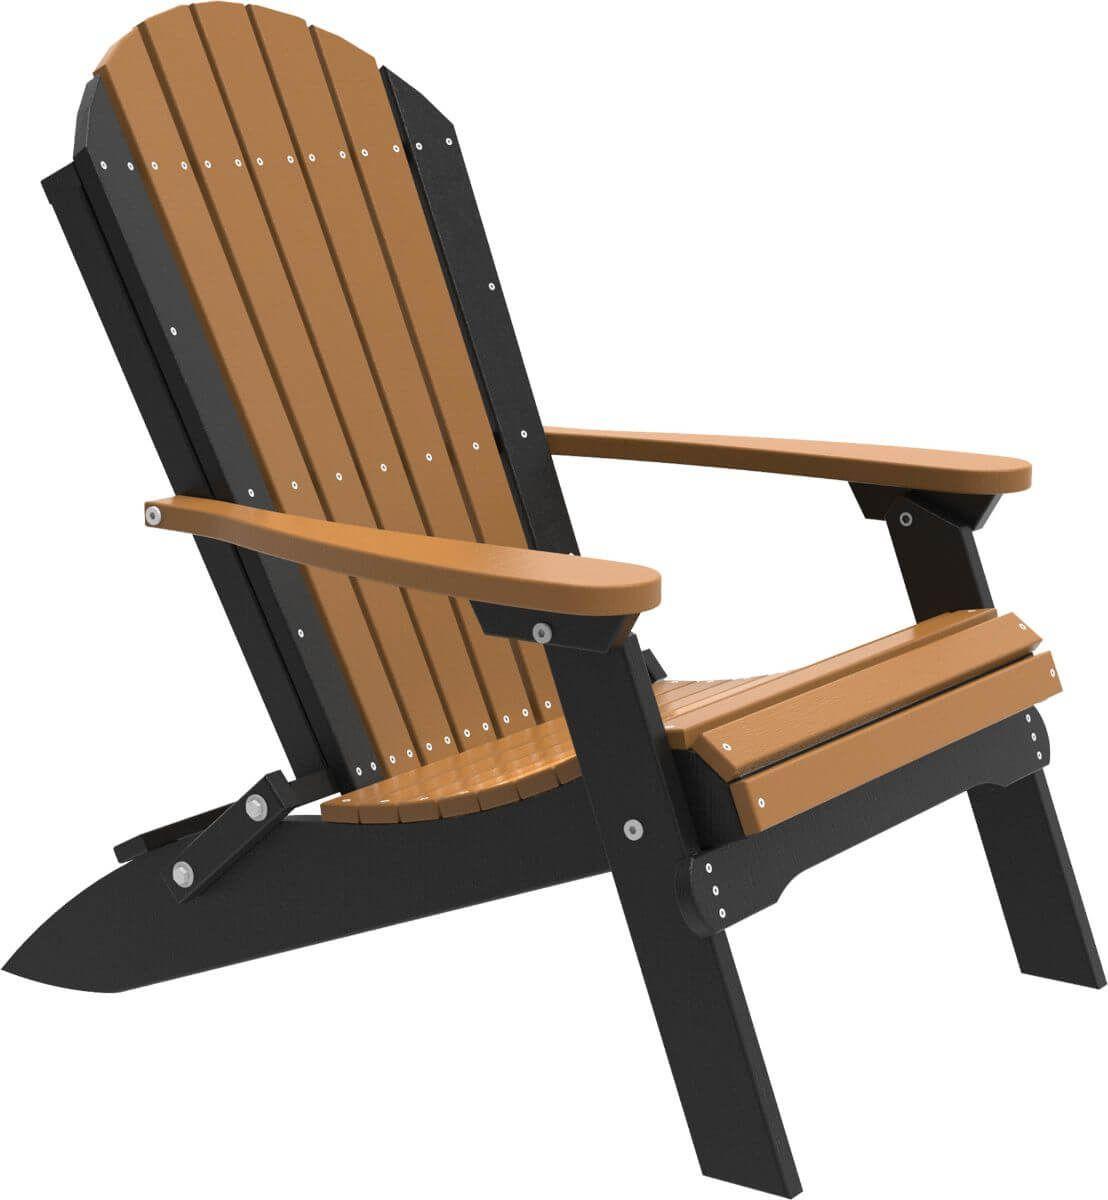 Cedar and Black Tahiti Folding Adirondack Chair